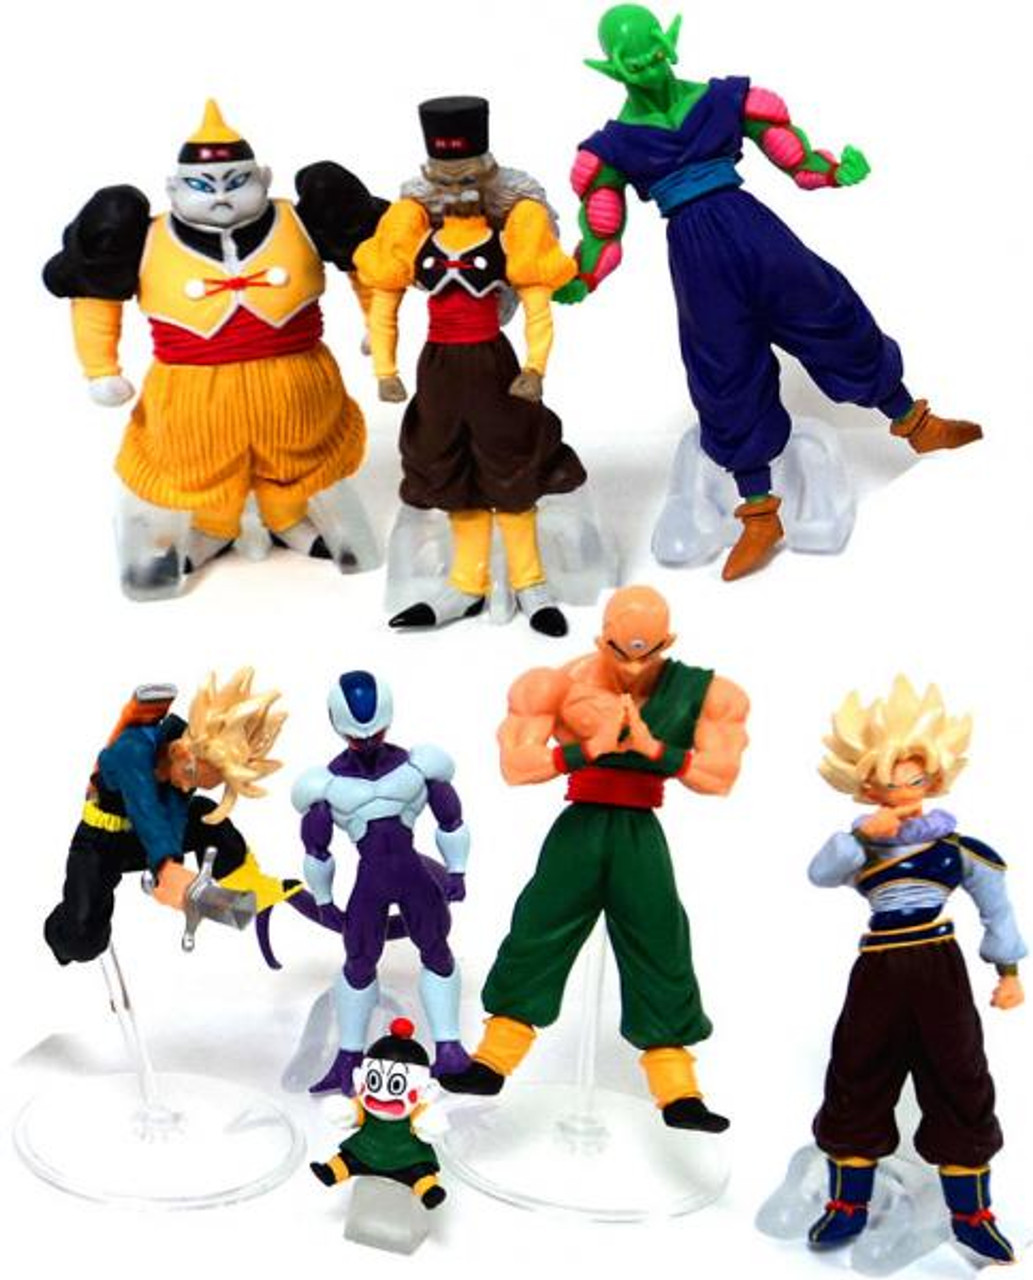 Dragon Ball Z Set of 7 Conflict 3.5-Inch Mini PVC Figures